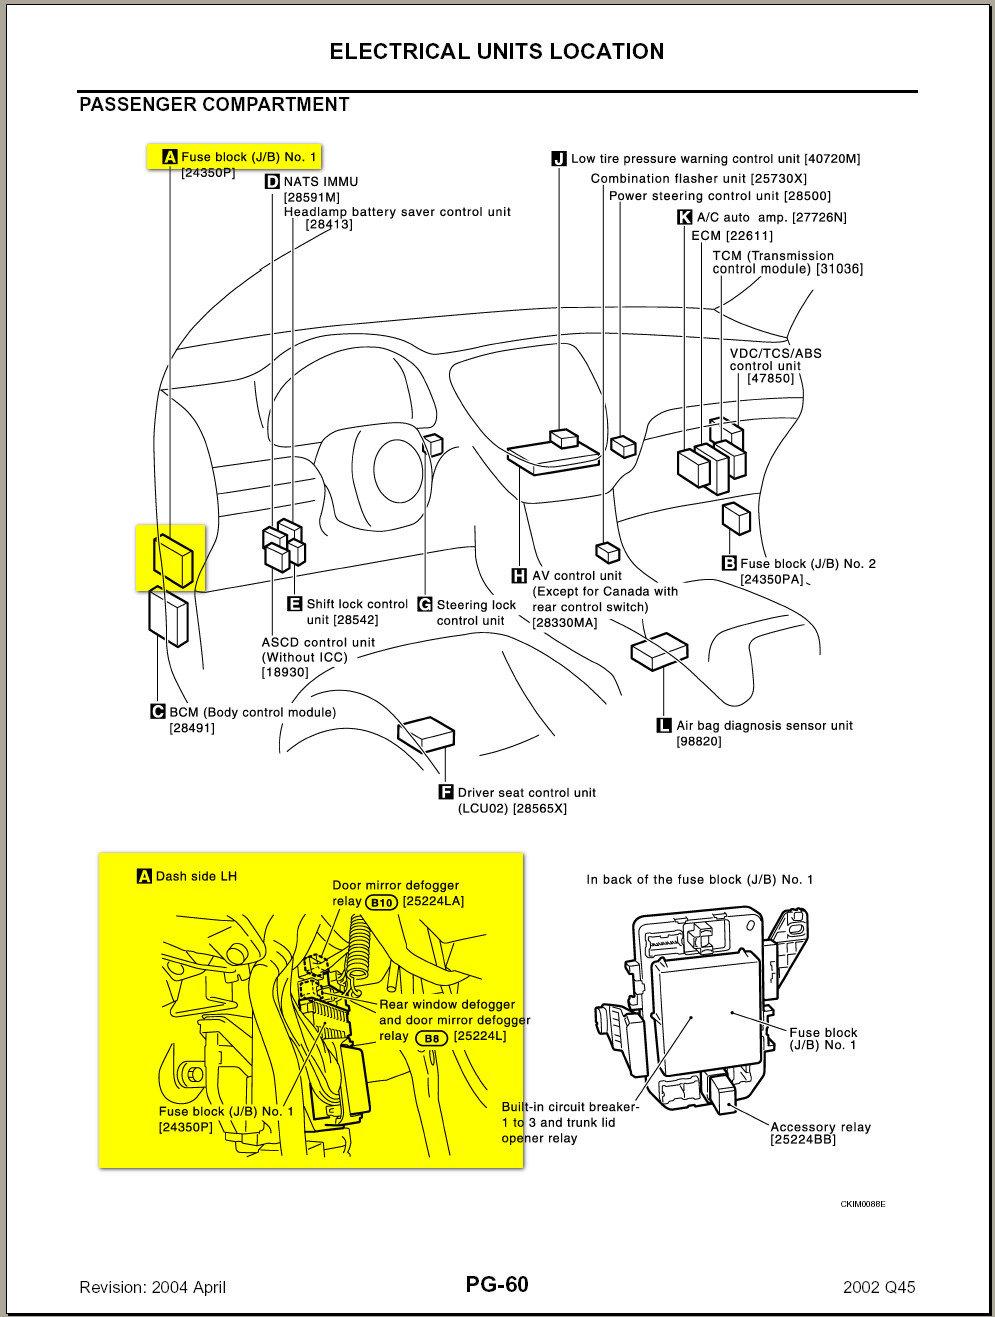 2002 Infiniti Q45 Fuse Box Diagram   Wiring Diagram on